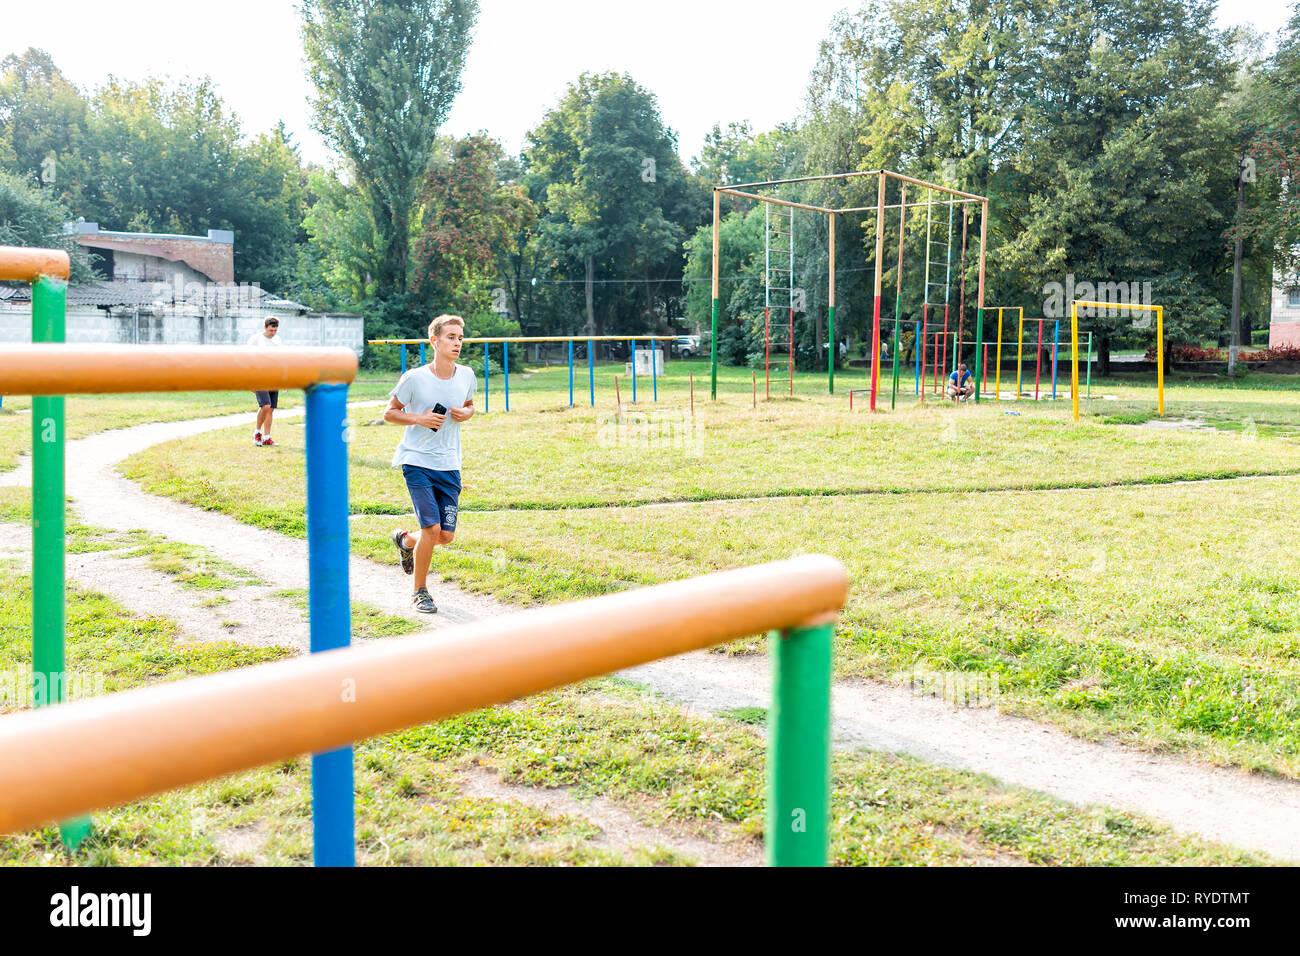 Rivne, Ukraine - August 21, 2018: Rovno city in western